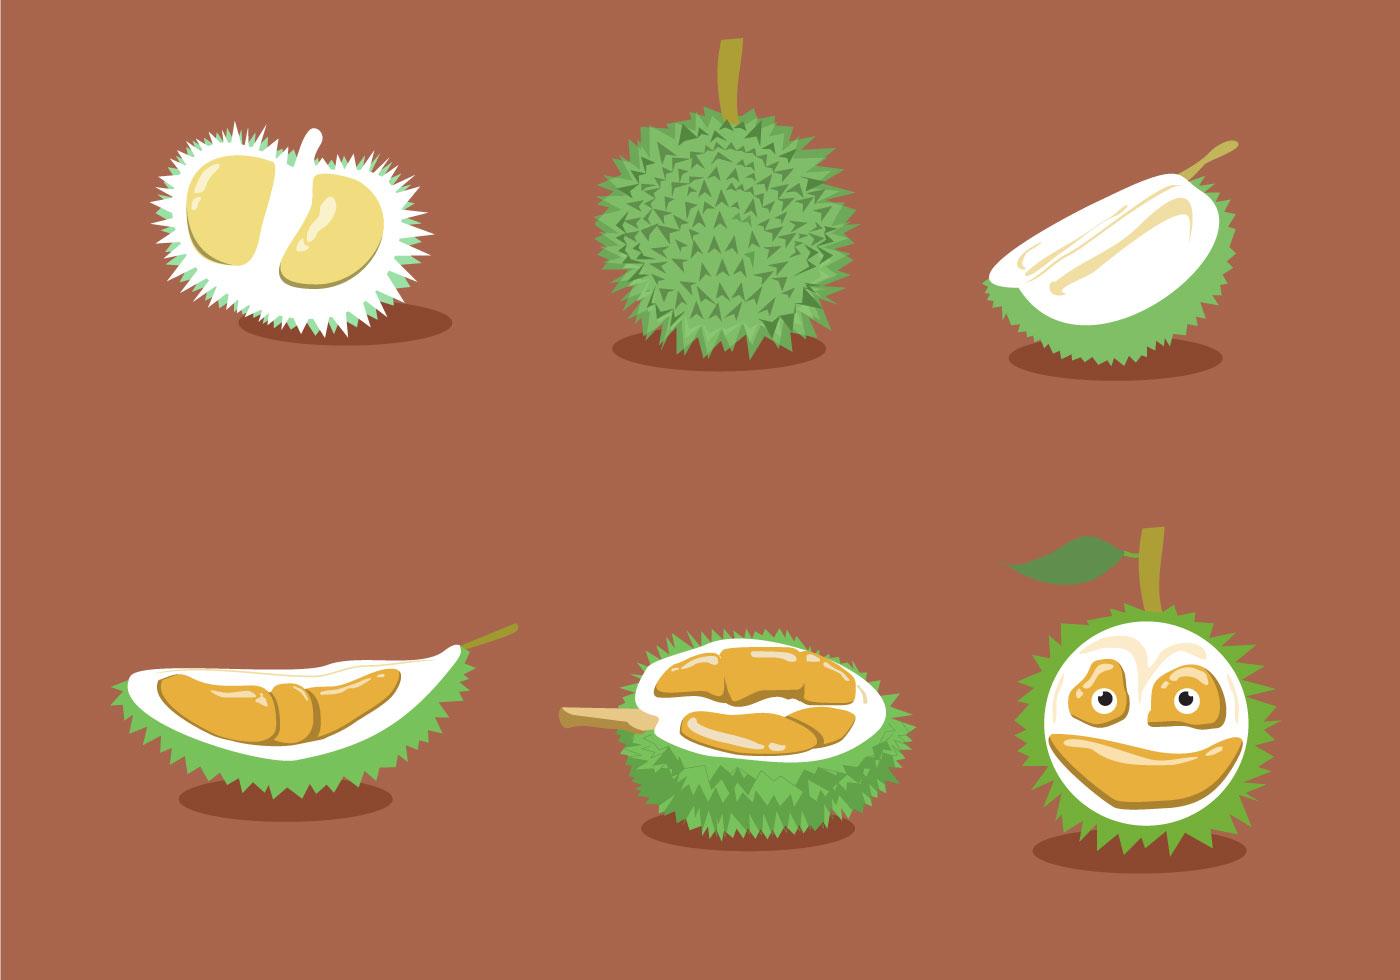 durian vectors download free vectors clipart graphics vector art https www vecteezy com vector art 101644 durian vectors